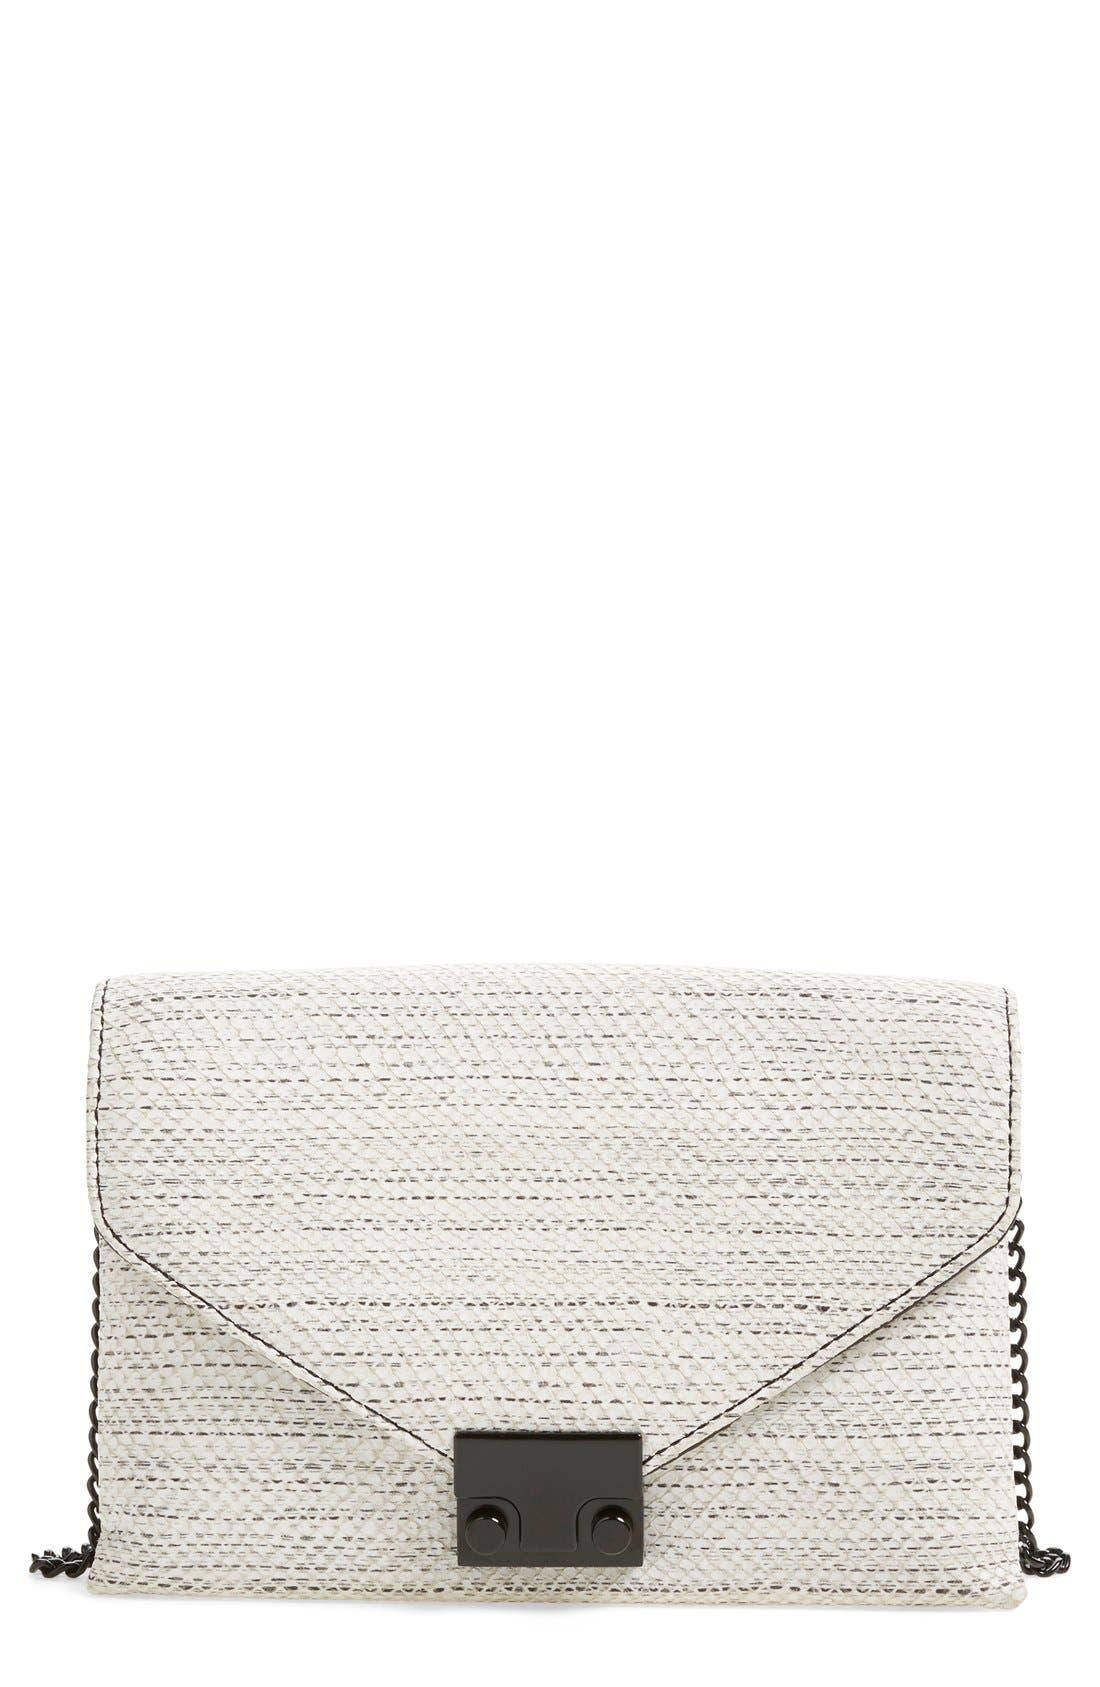 'Junior Lock' Leather Envelope Clutch,                             Main thumbnail 1, color,                             White Black